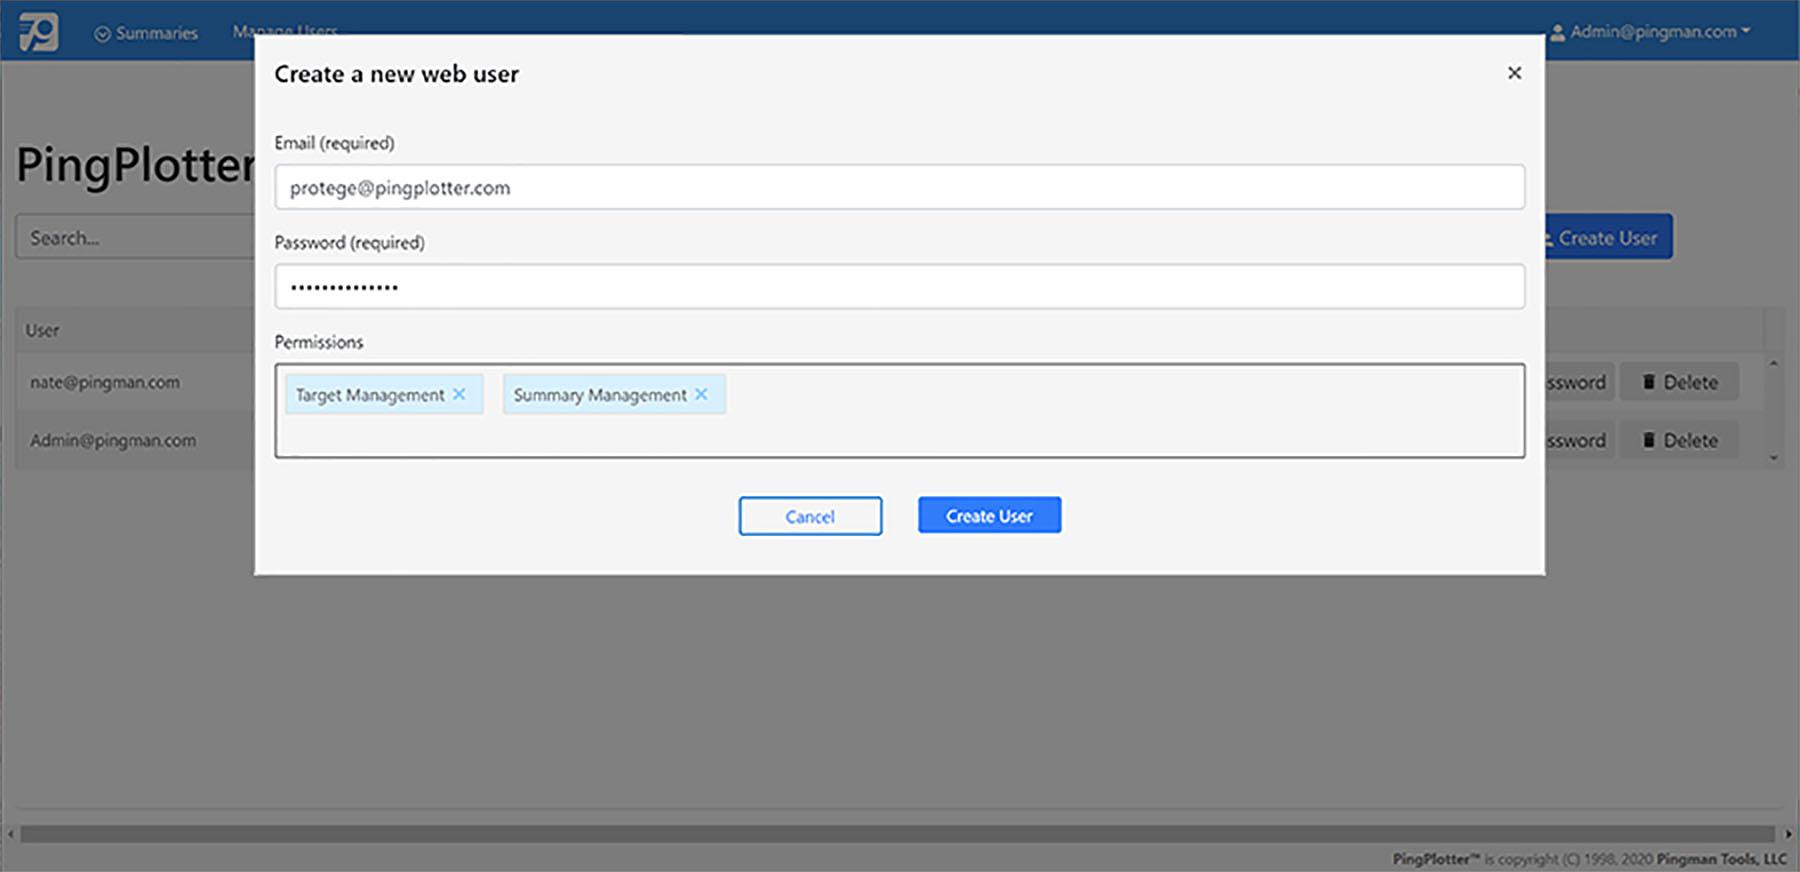 PingPlotter create new web user